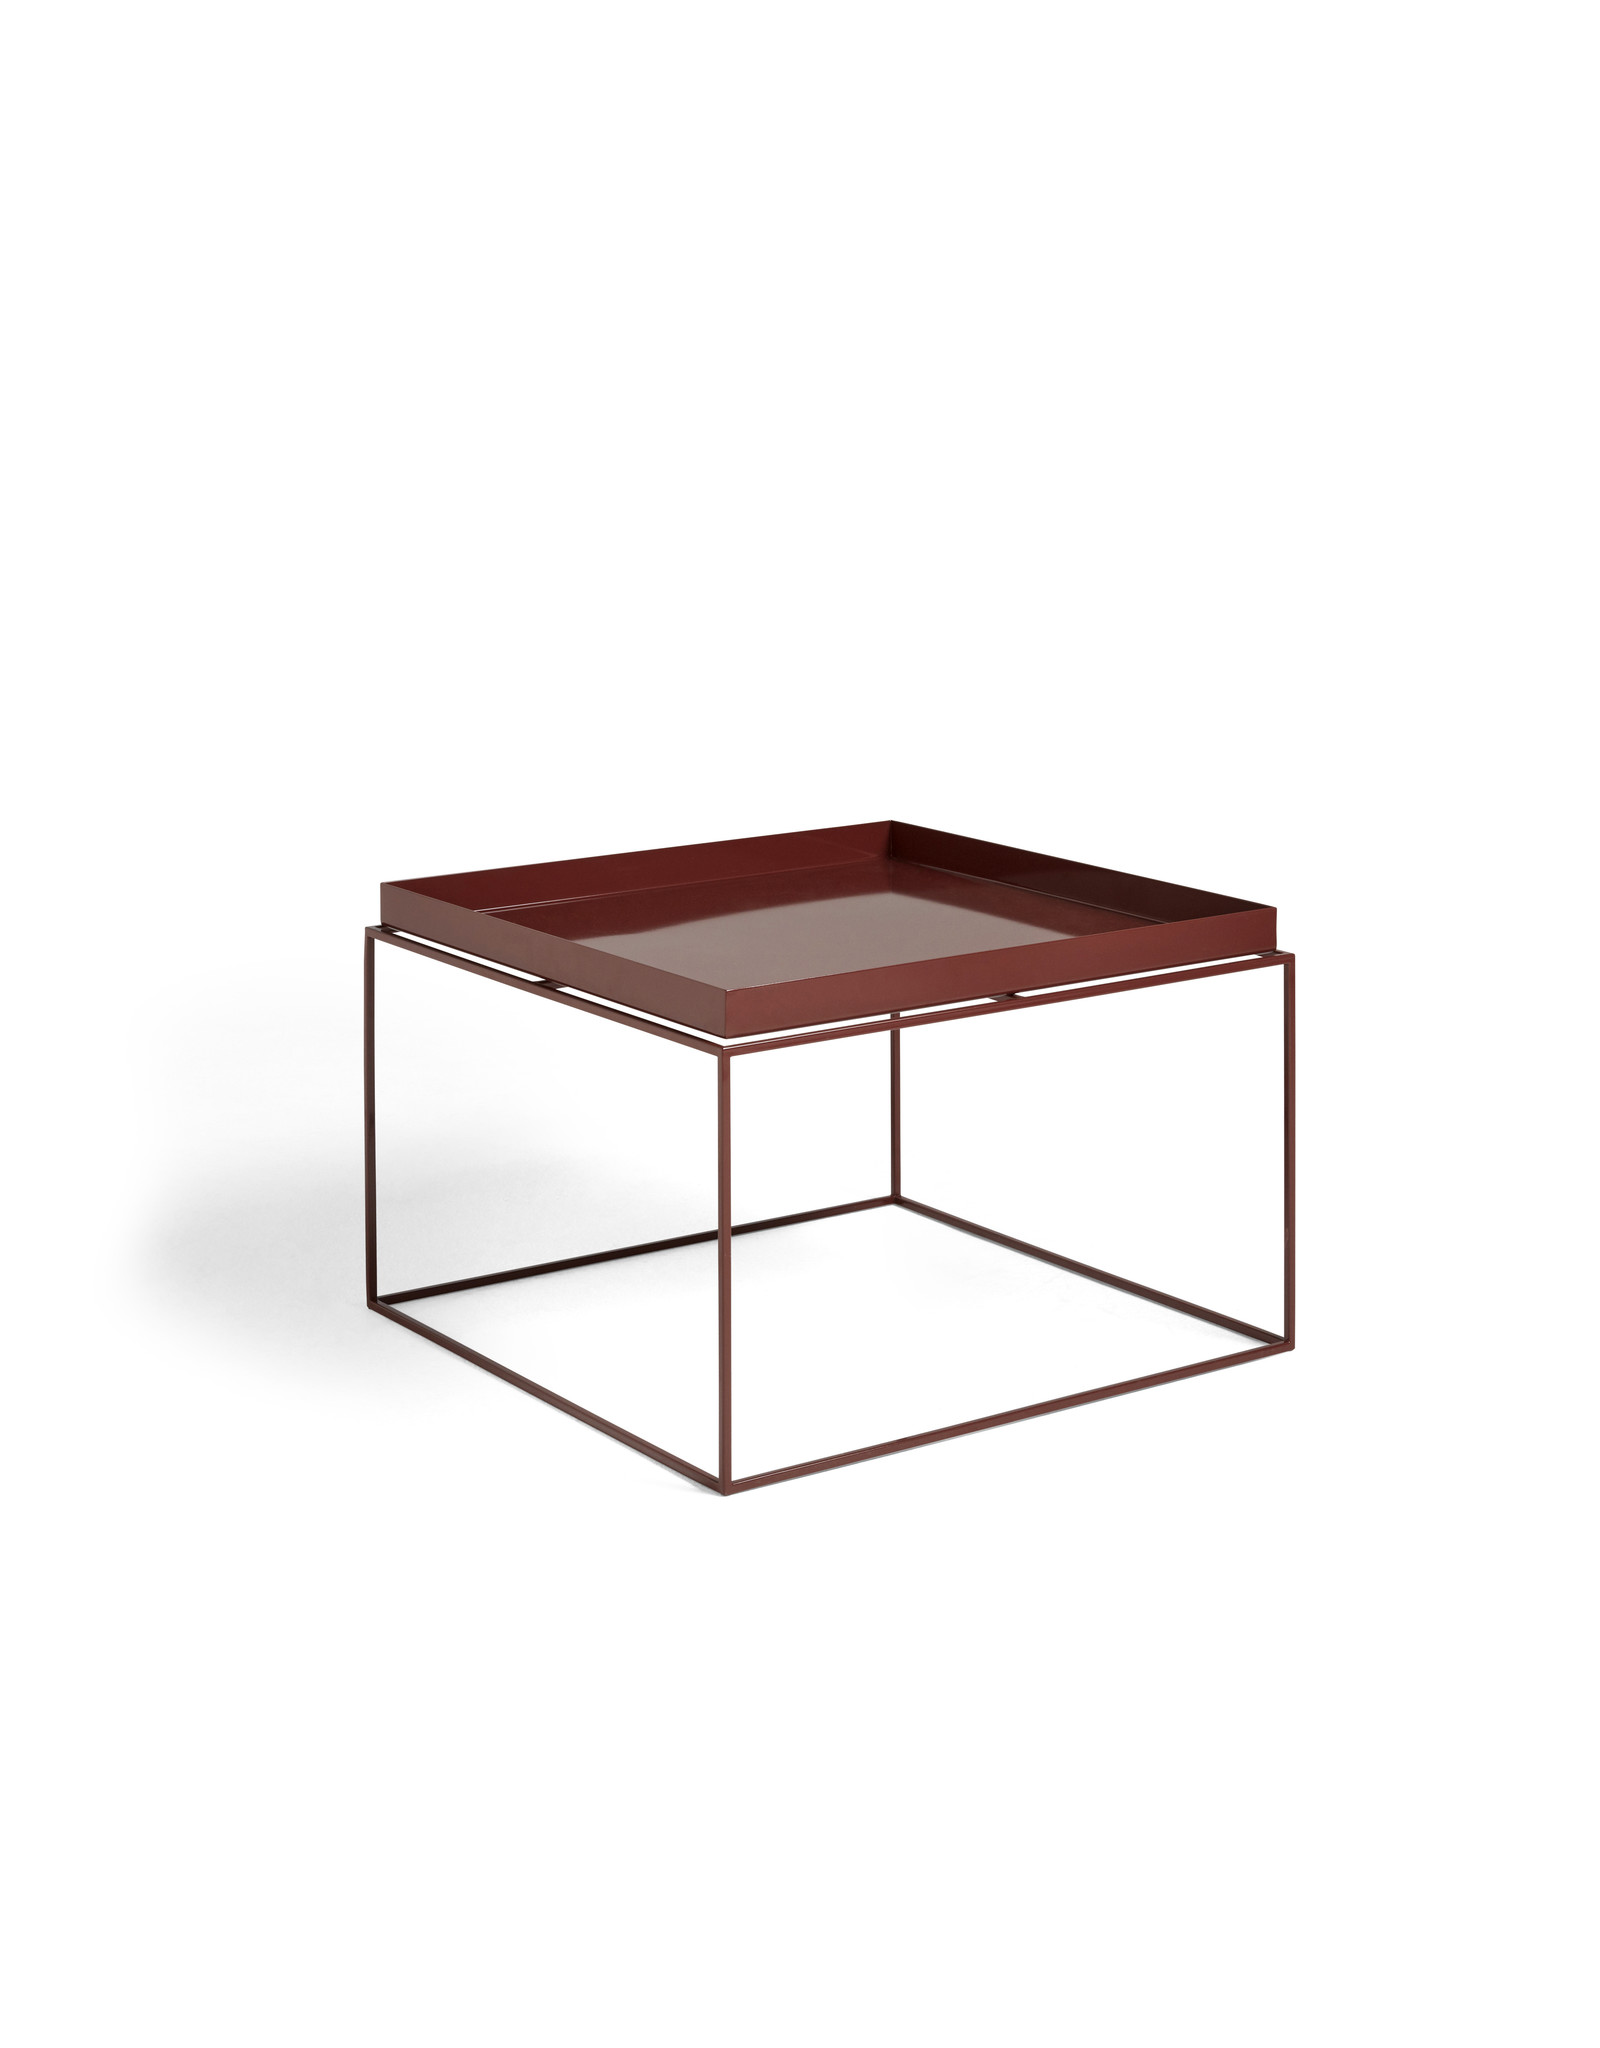 HAY TRAY TABLE / COFFEE SIDE TABLE CHOCOLATE HIGH GLOSS